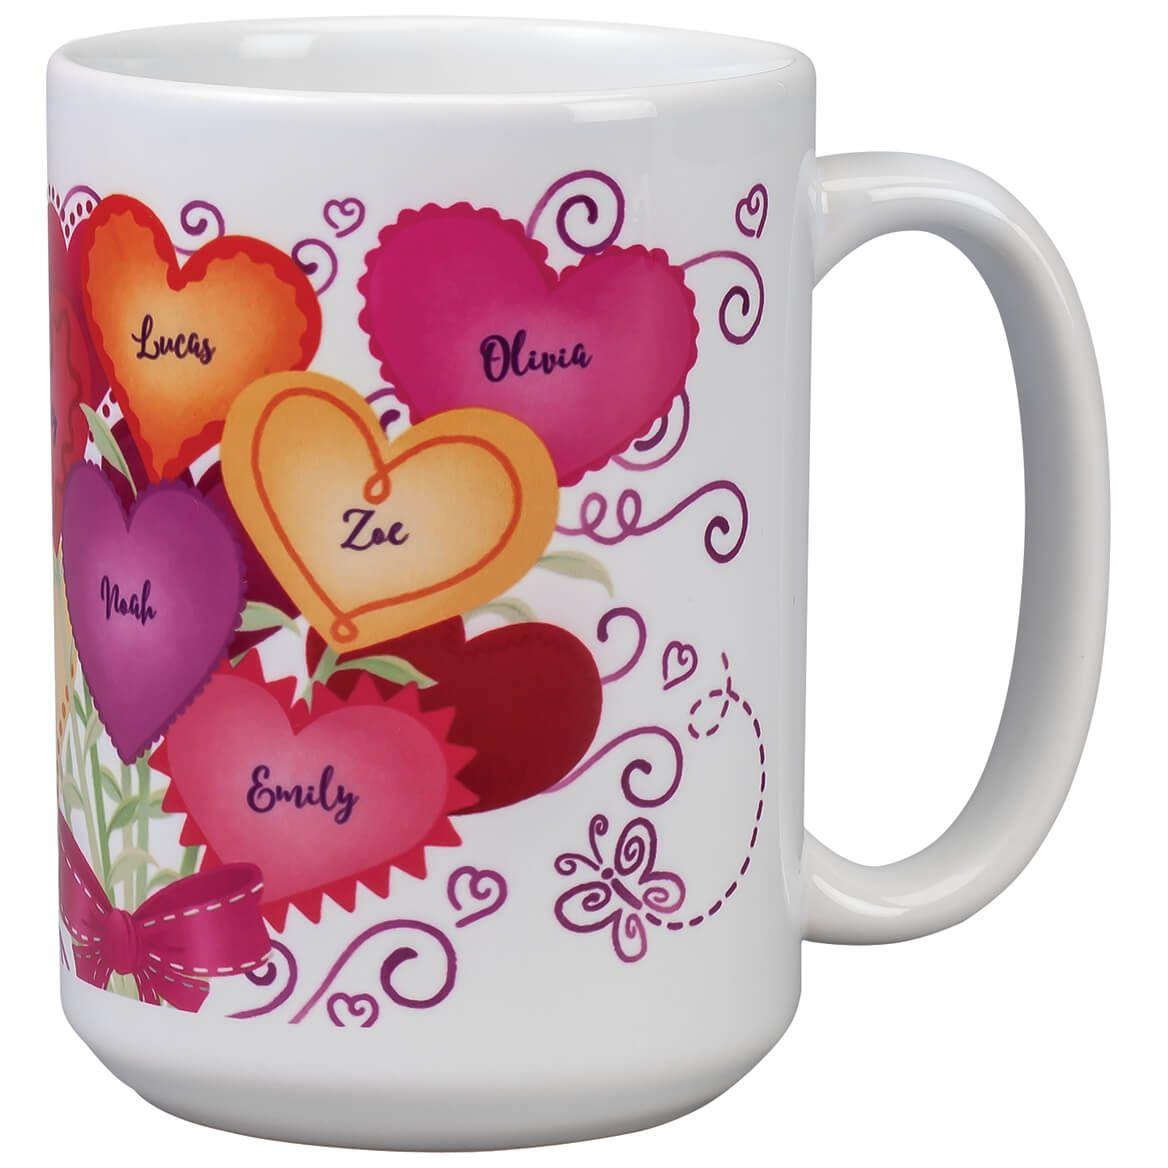 Personalized M.O.M. Heart Bouquet Mug-369377